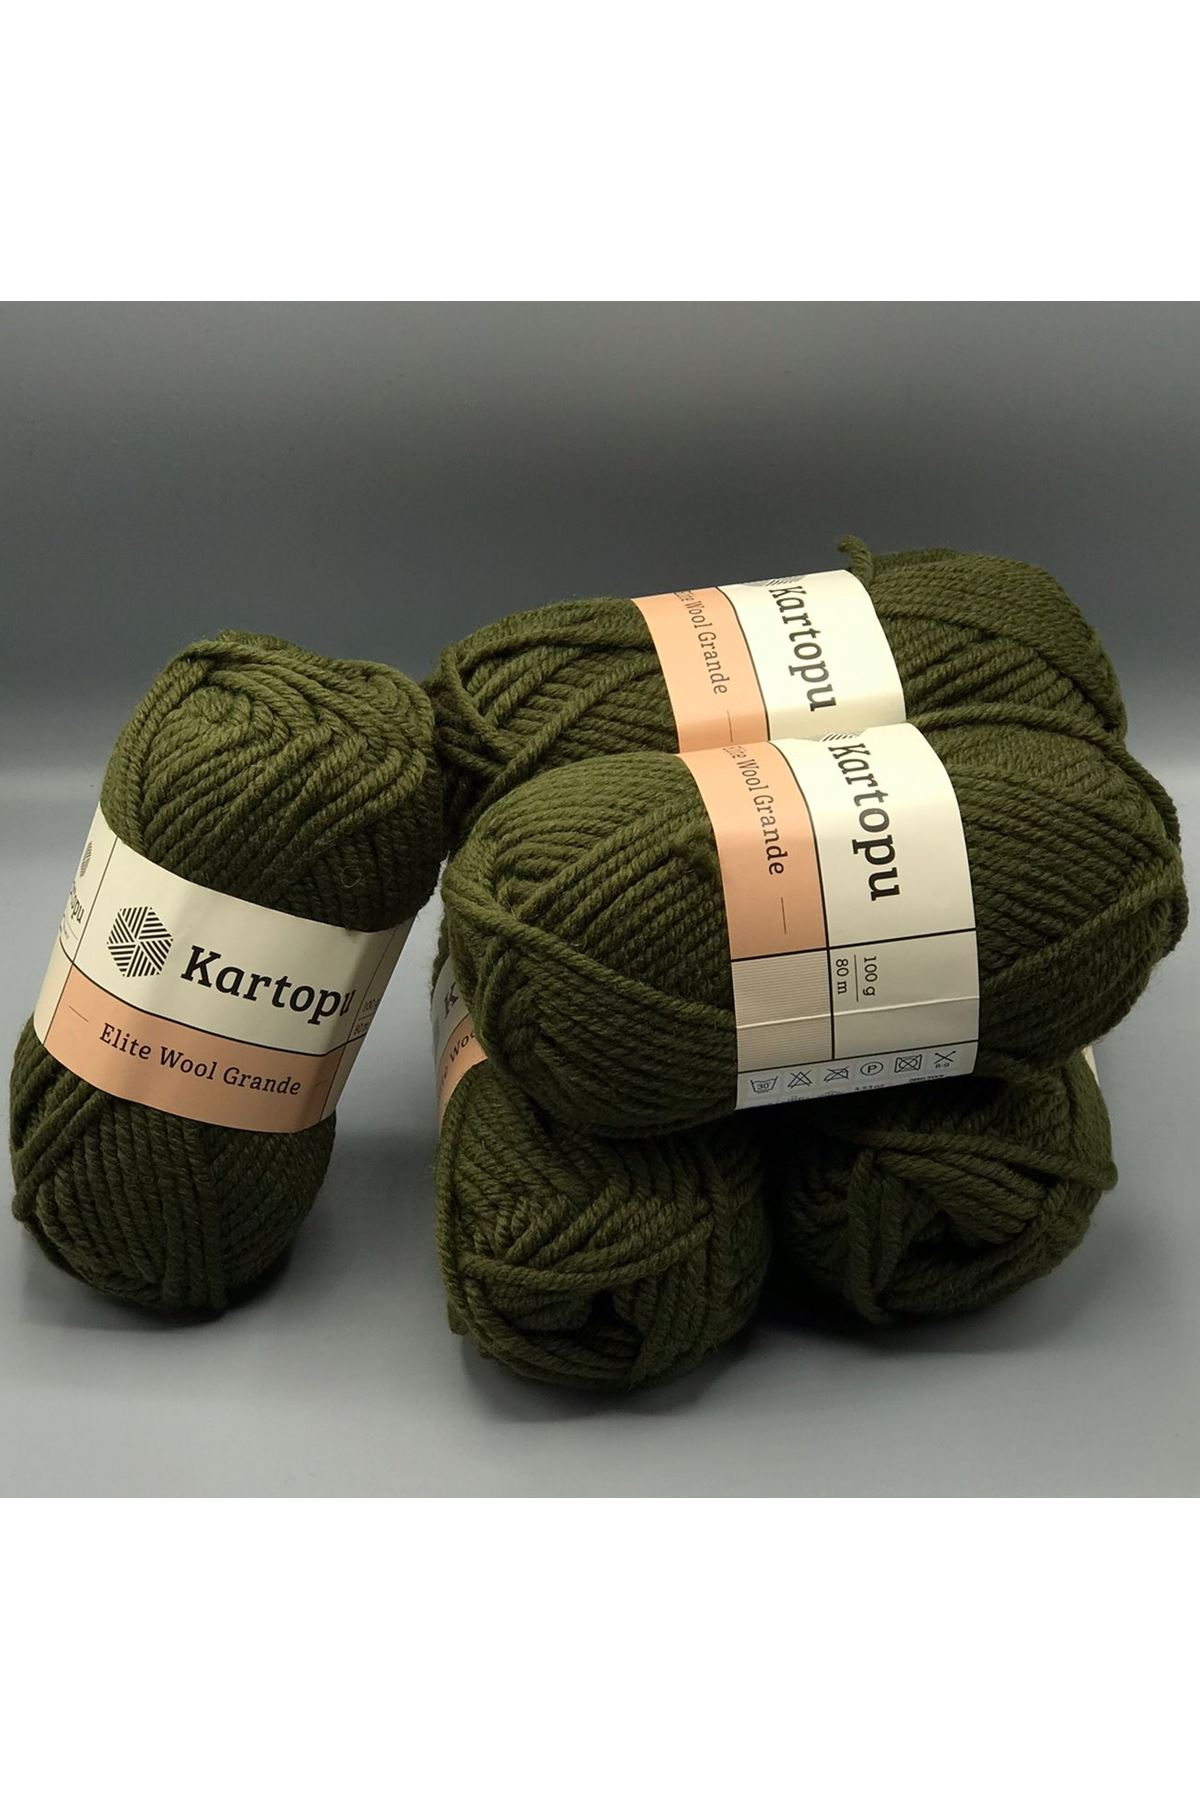 Kartopu Elite Wool Grande 5'li Paket K1405 Haki